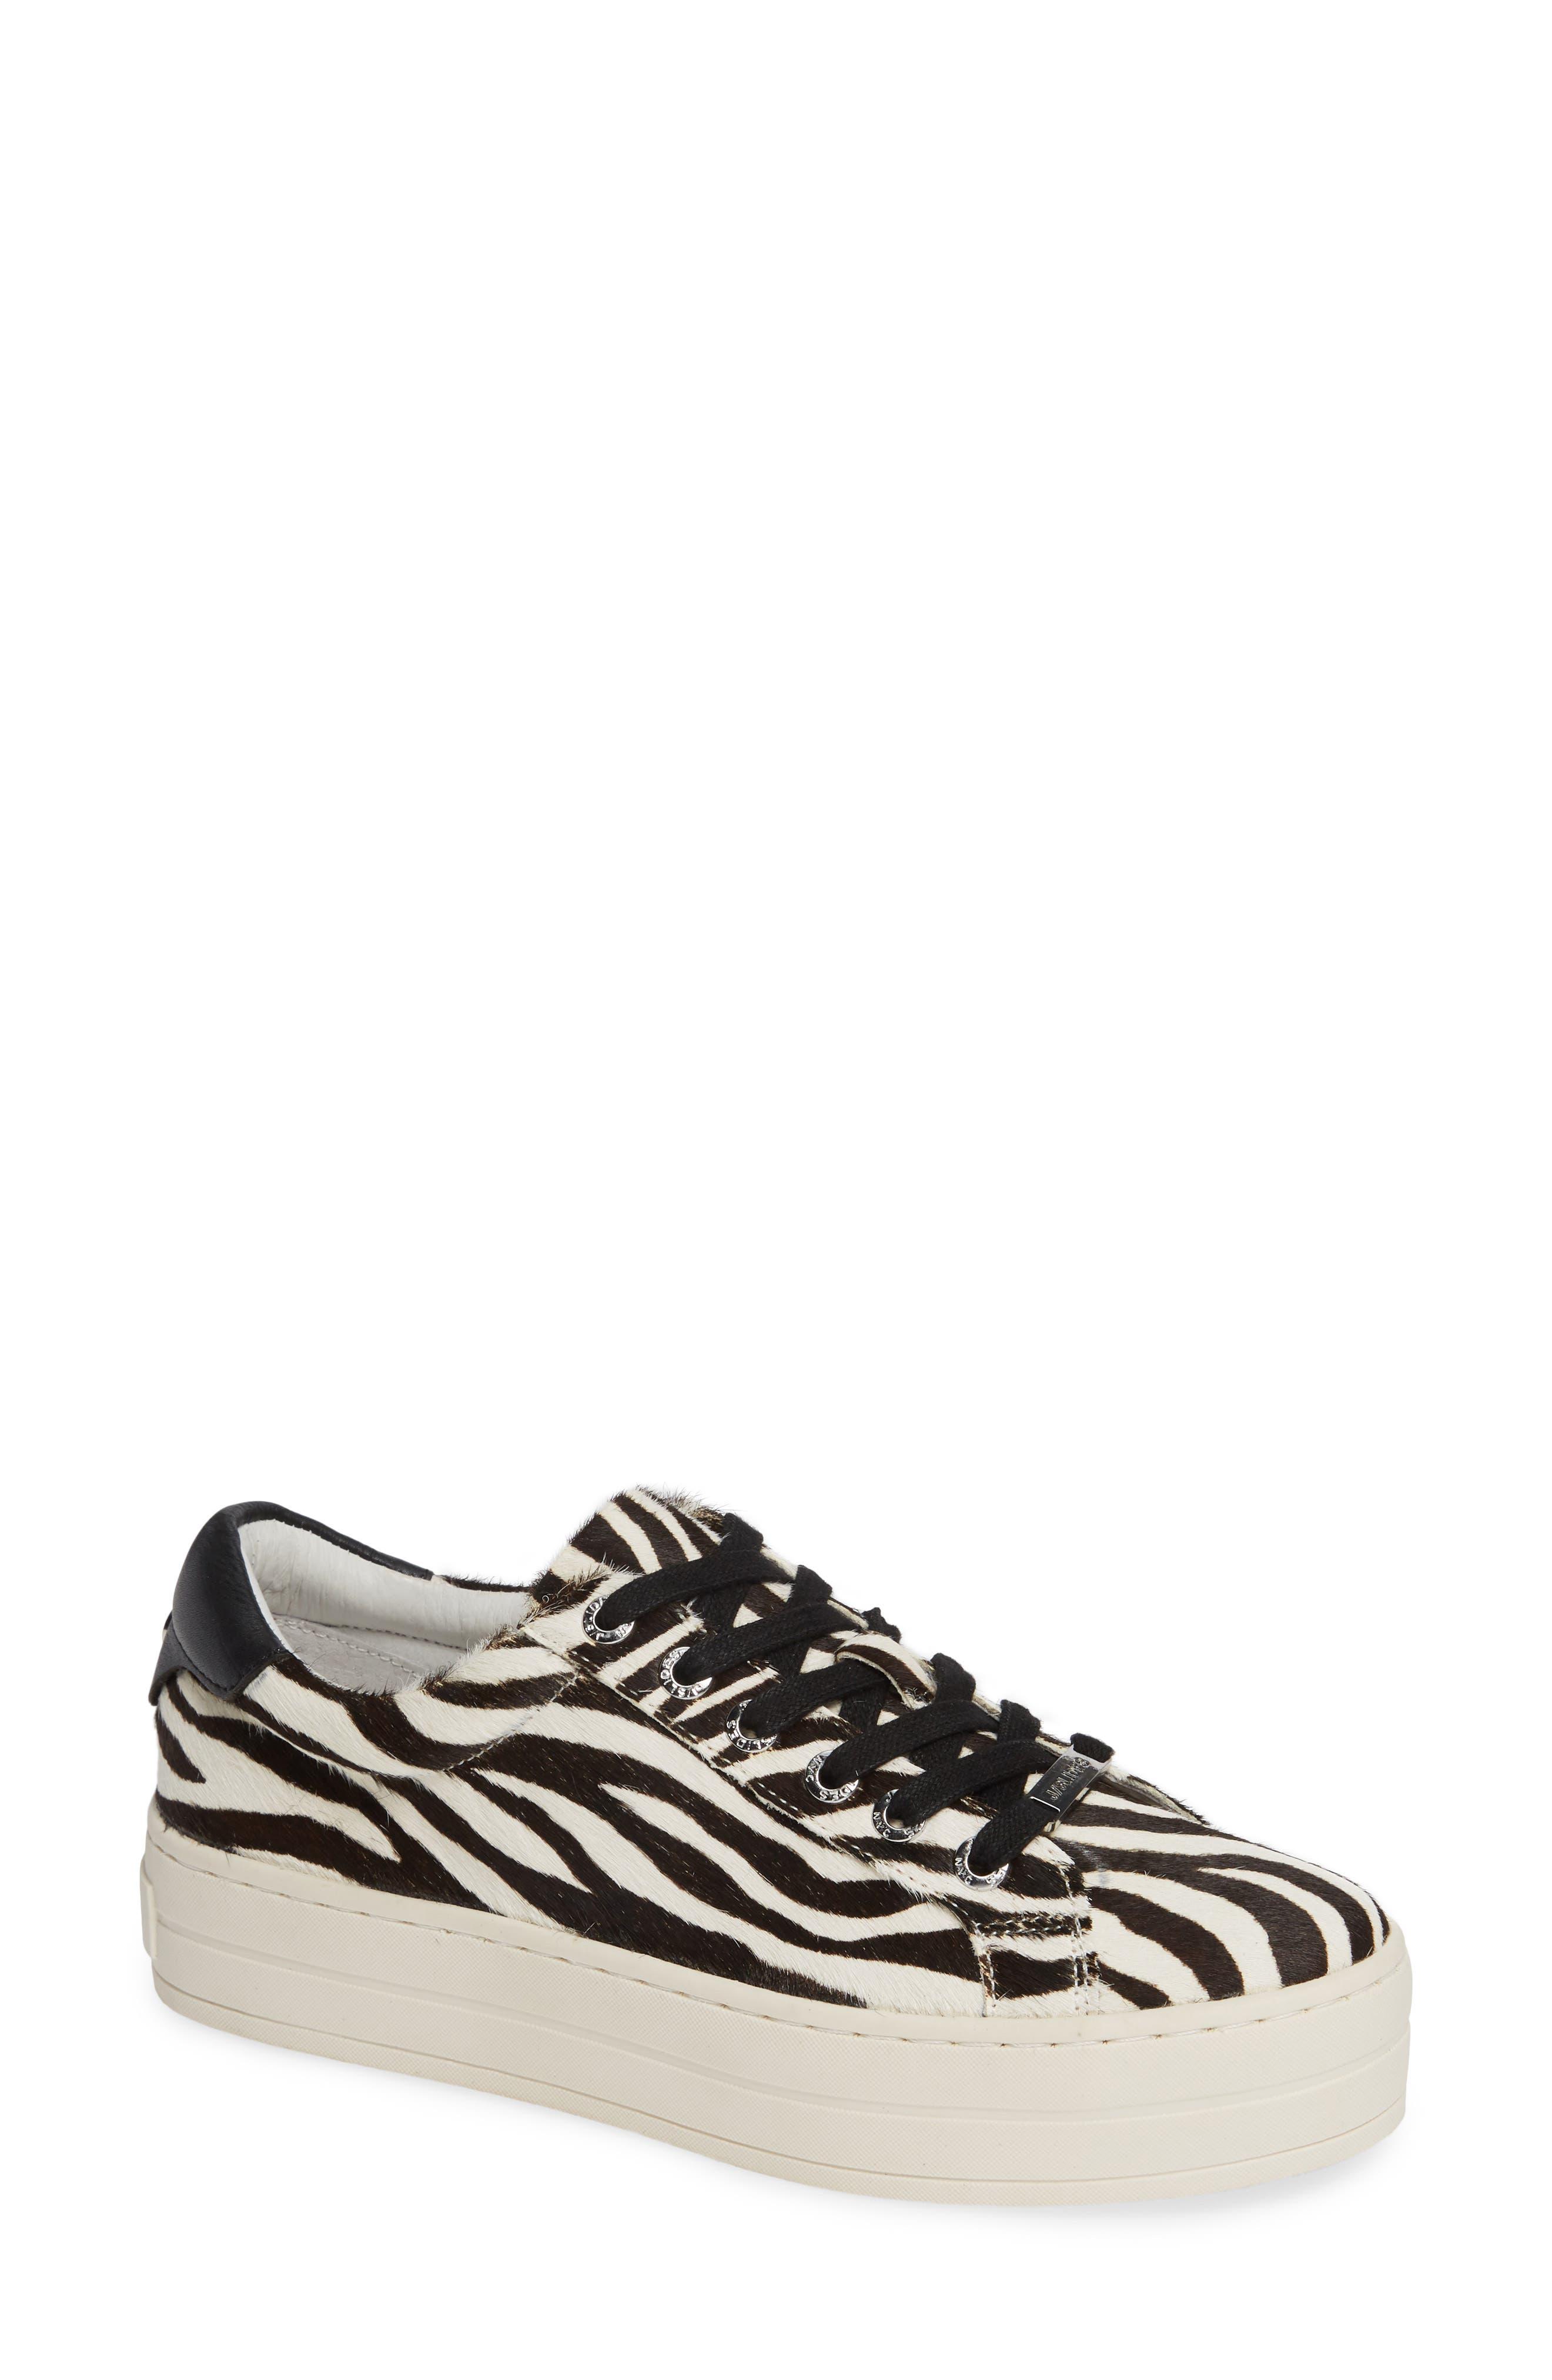 Jslides Hippie Genuine Calf Hair Platform Sneaker- Black